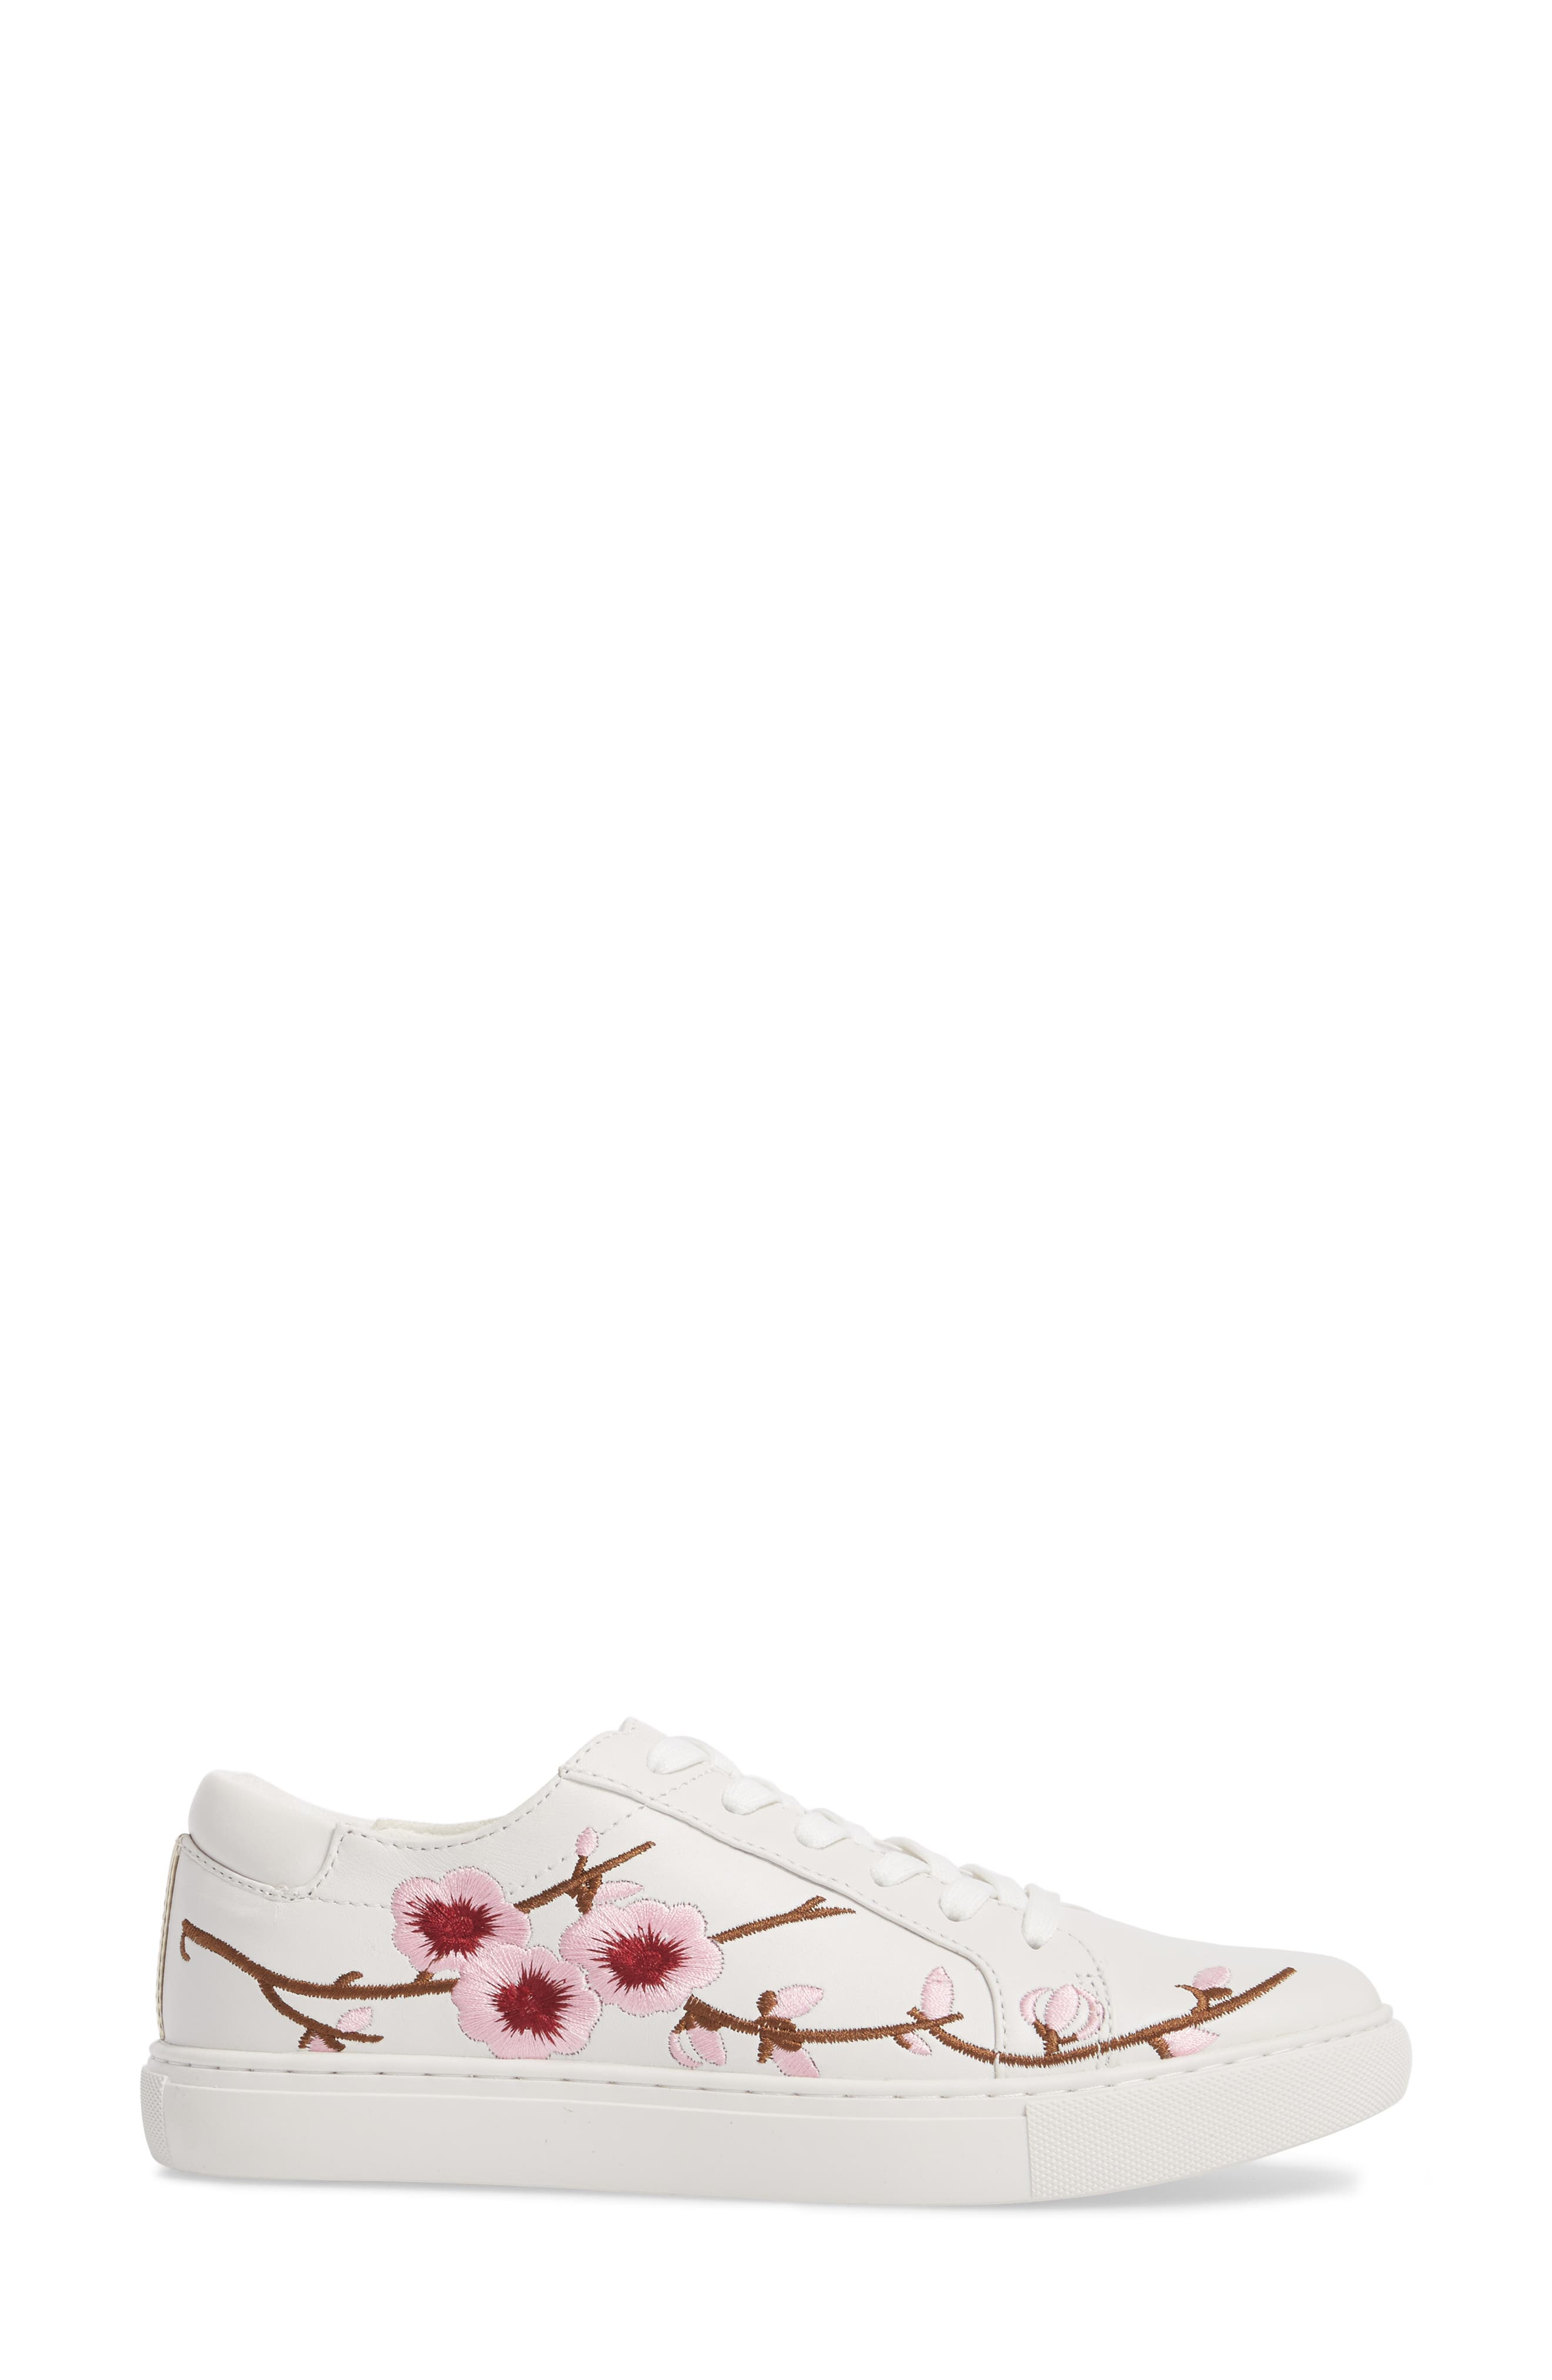 Kam Blossom Embroidered Sneaker,                             Alternate thumbnail 3, color,                             110